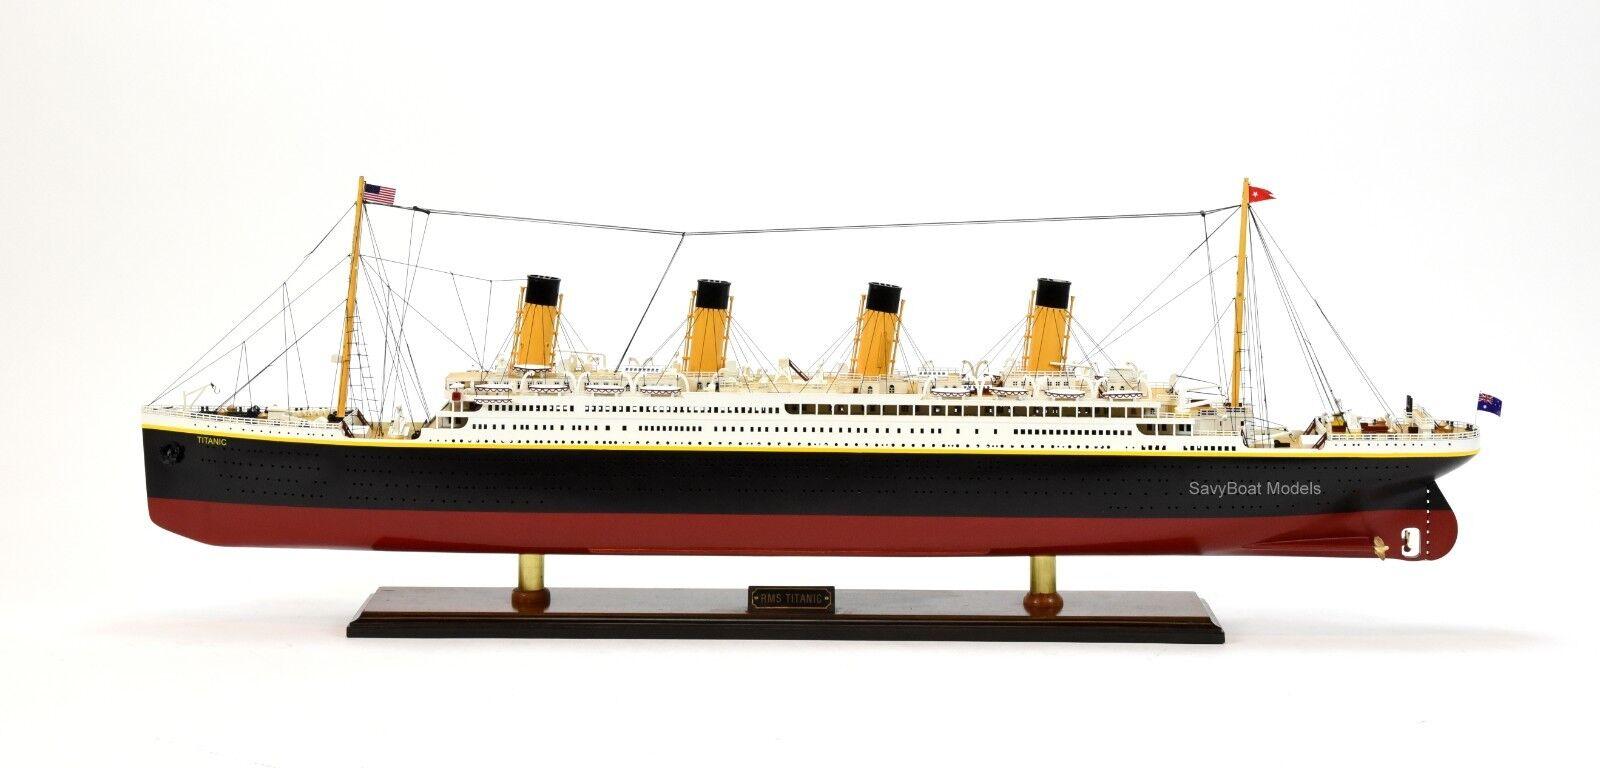 Rms Titanic Blanco Star Line Crucero Barco Hecho a Mano Modelo 40